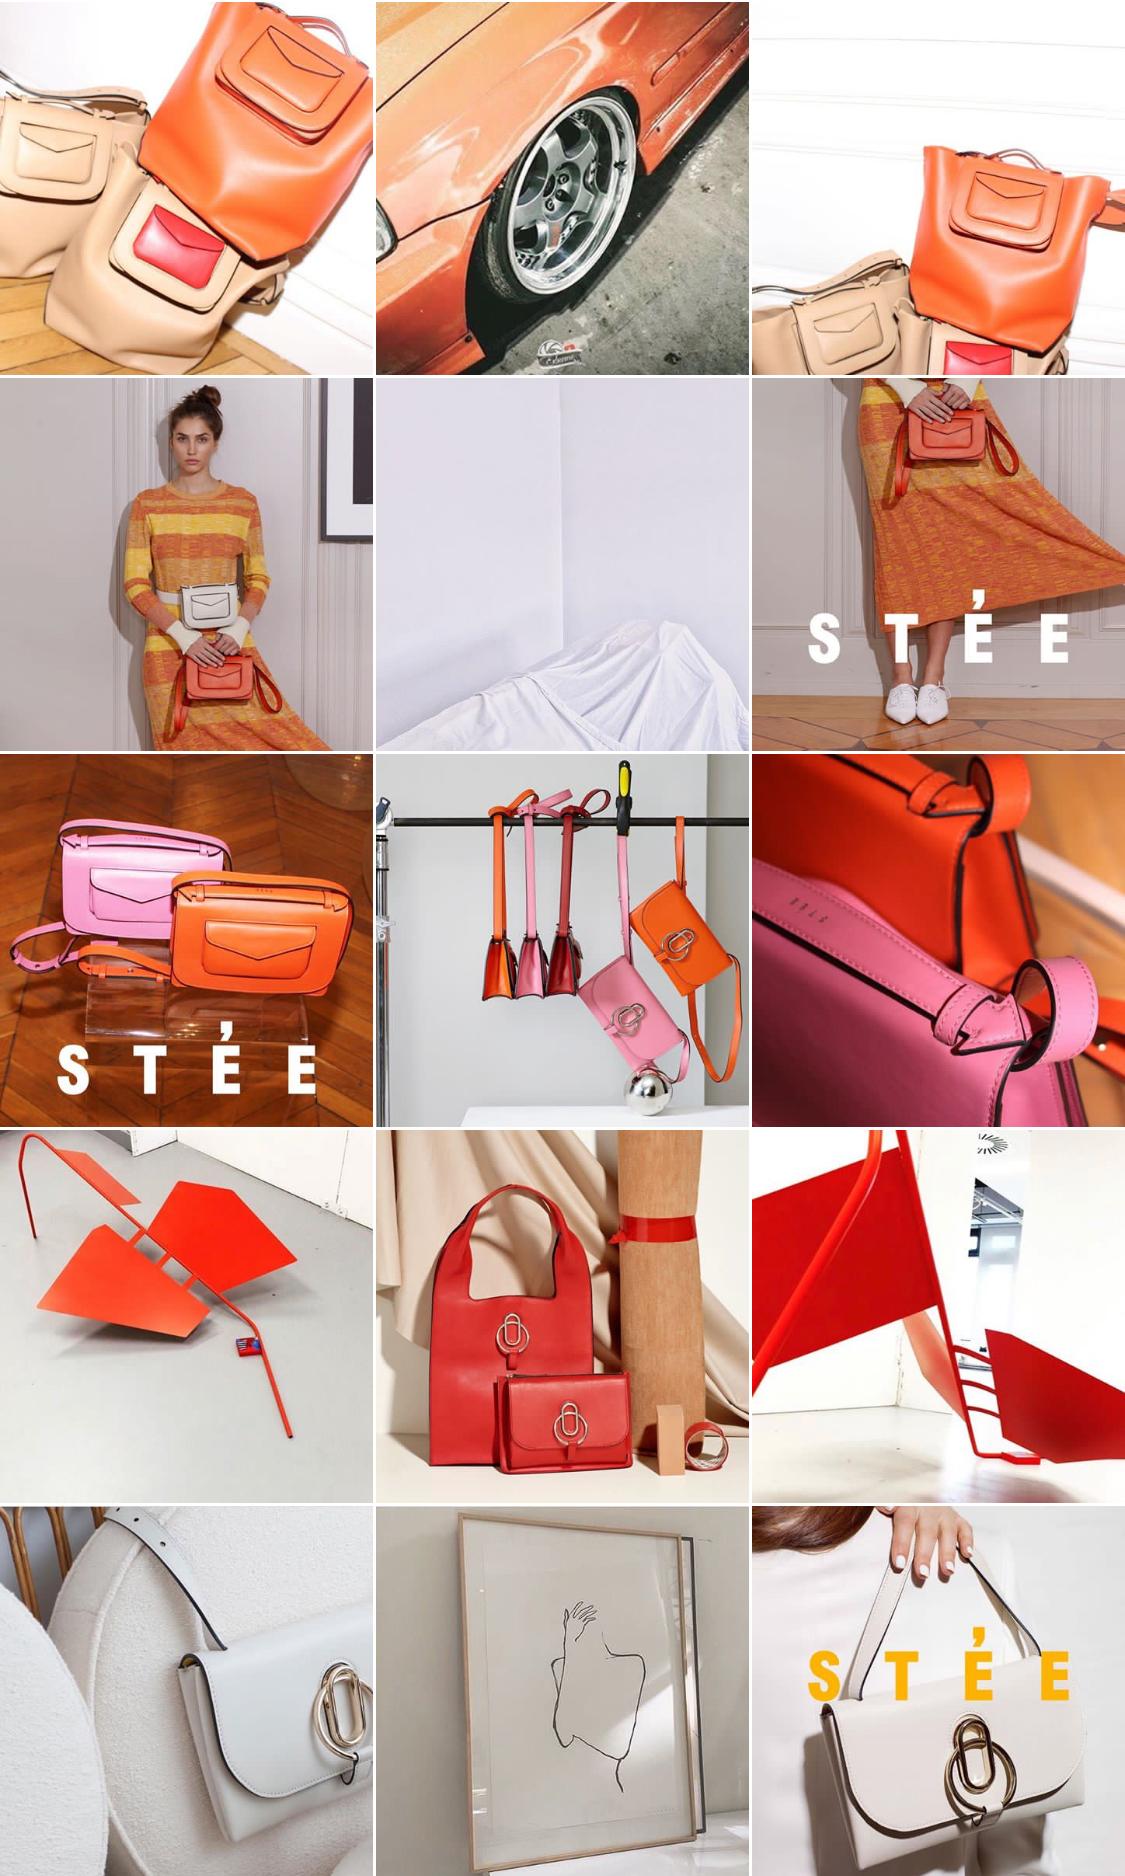 STEE_Instafeed6.jpg